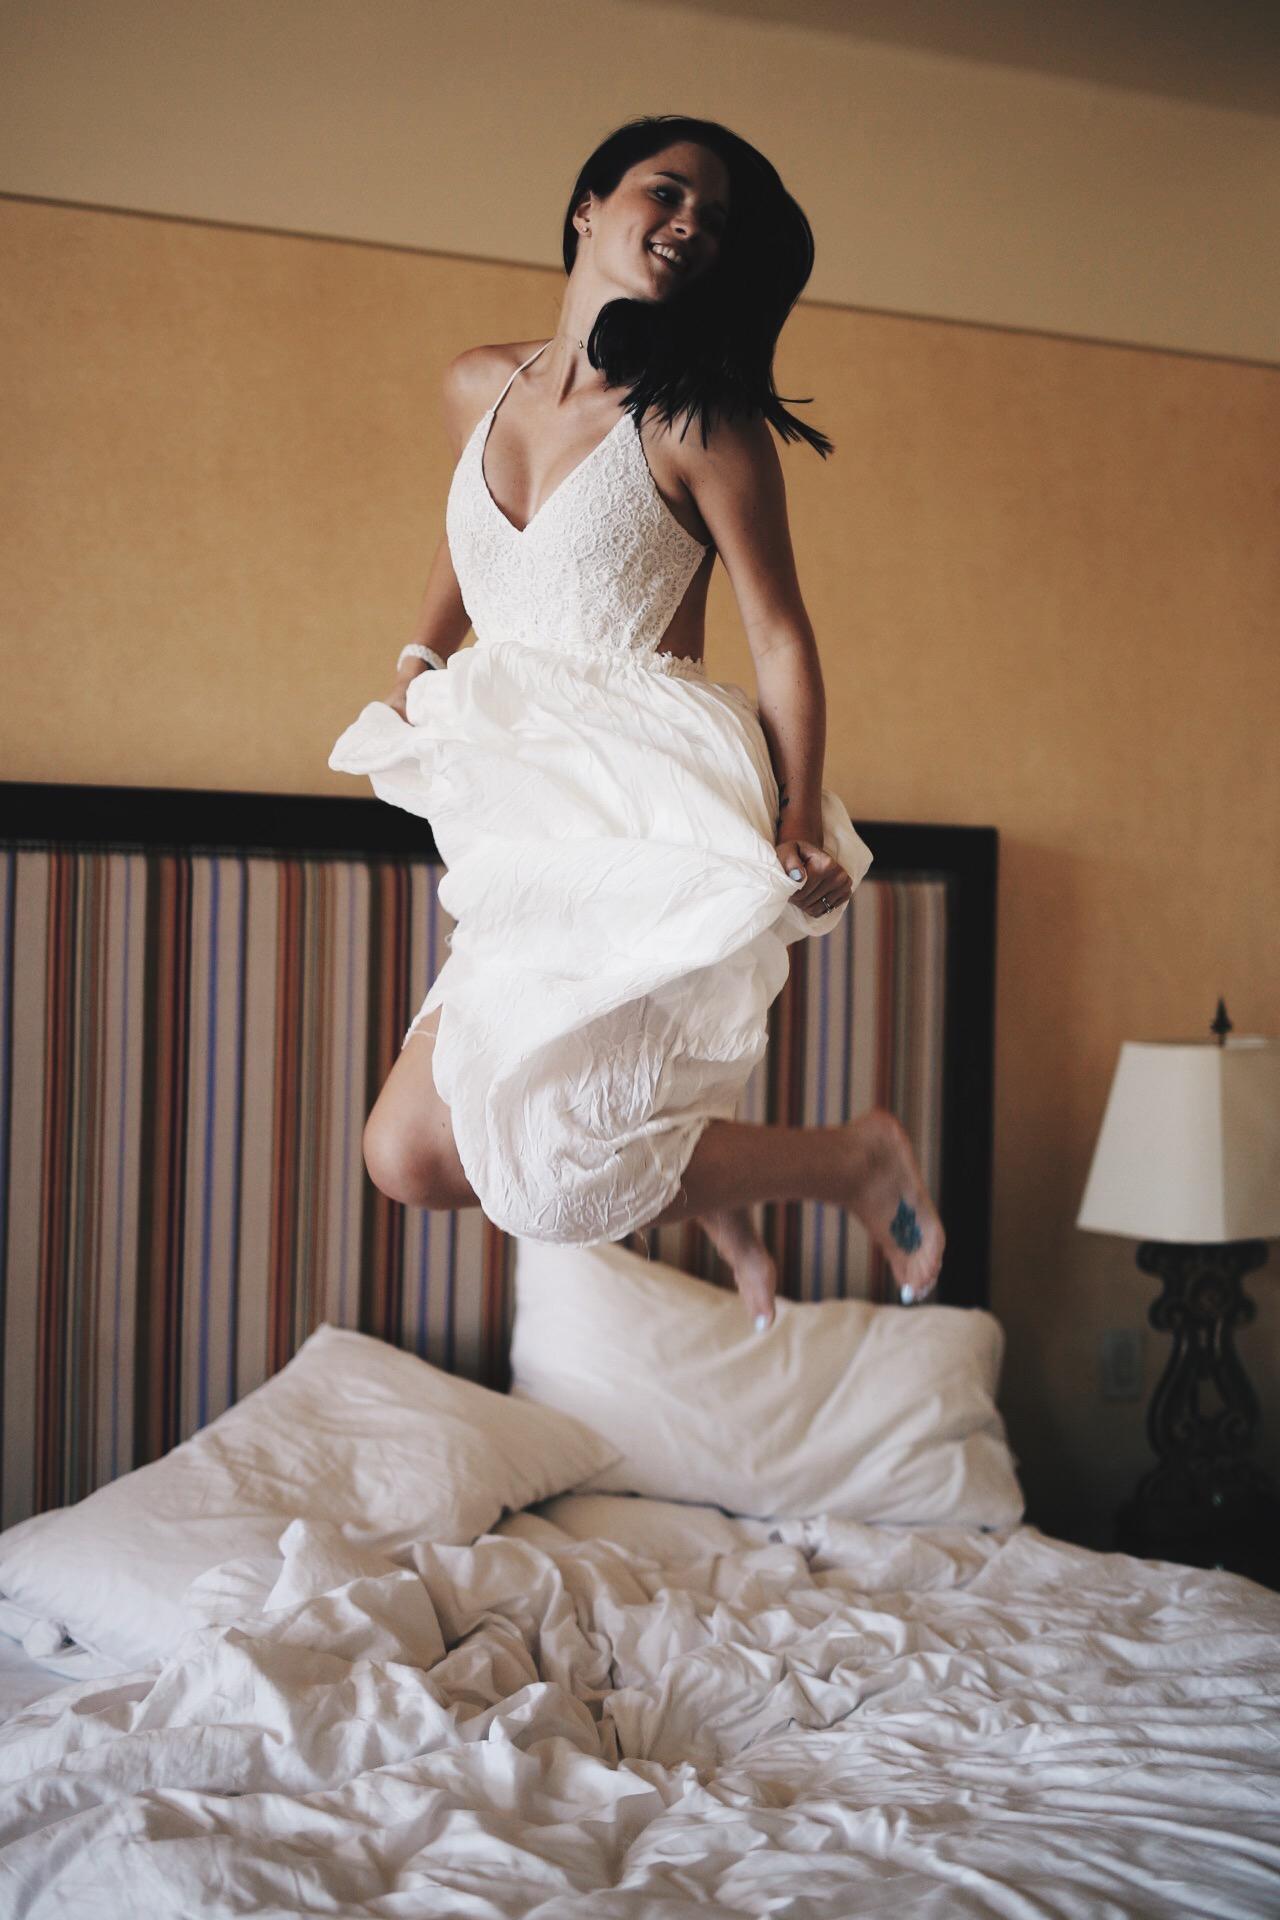 Scottsdale Mini Moon | wedding fashion | wedding style | wedding dresses | wedding outfit ideas || Dressed to Kill